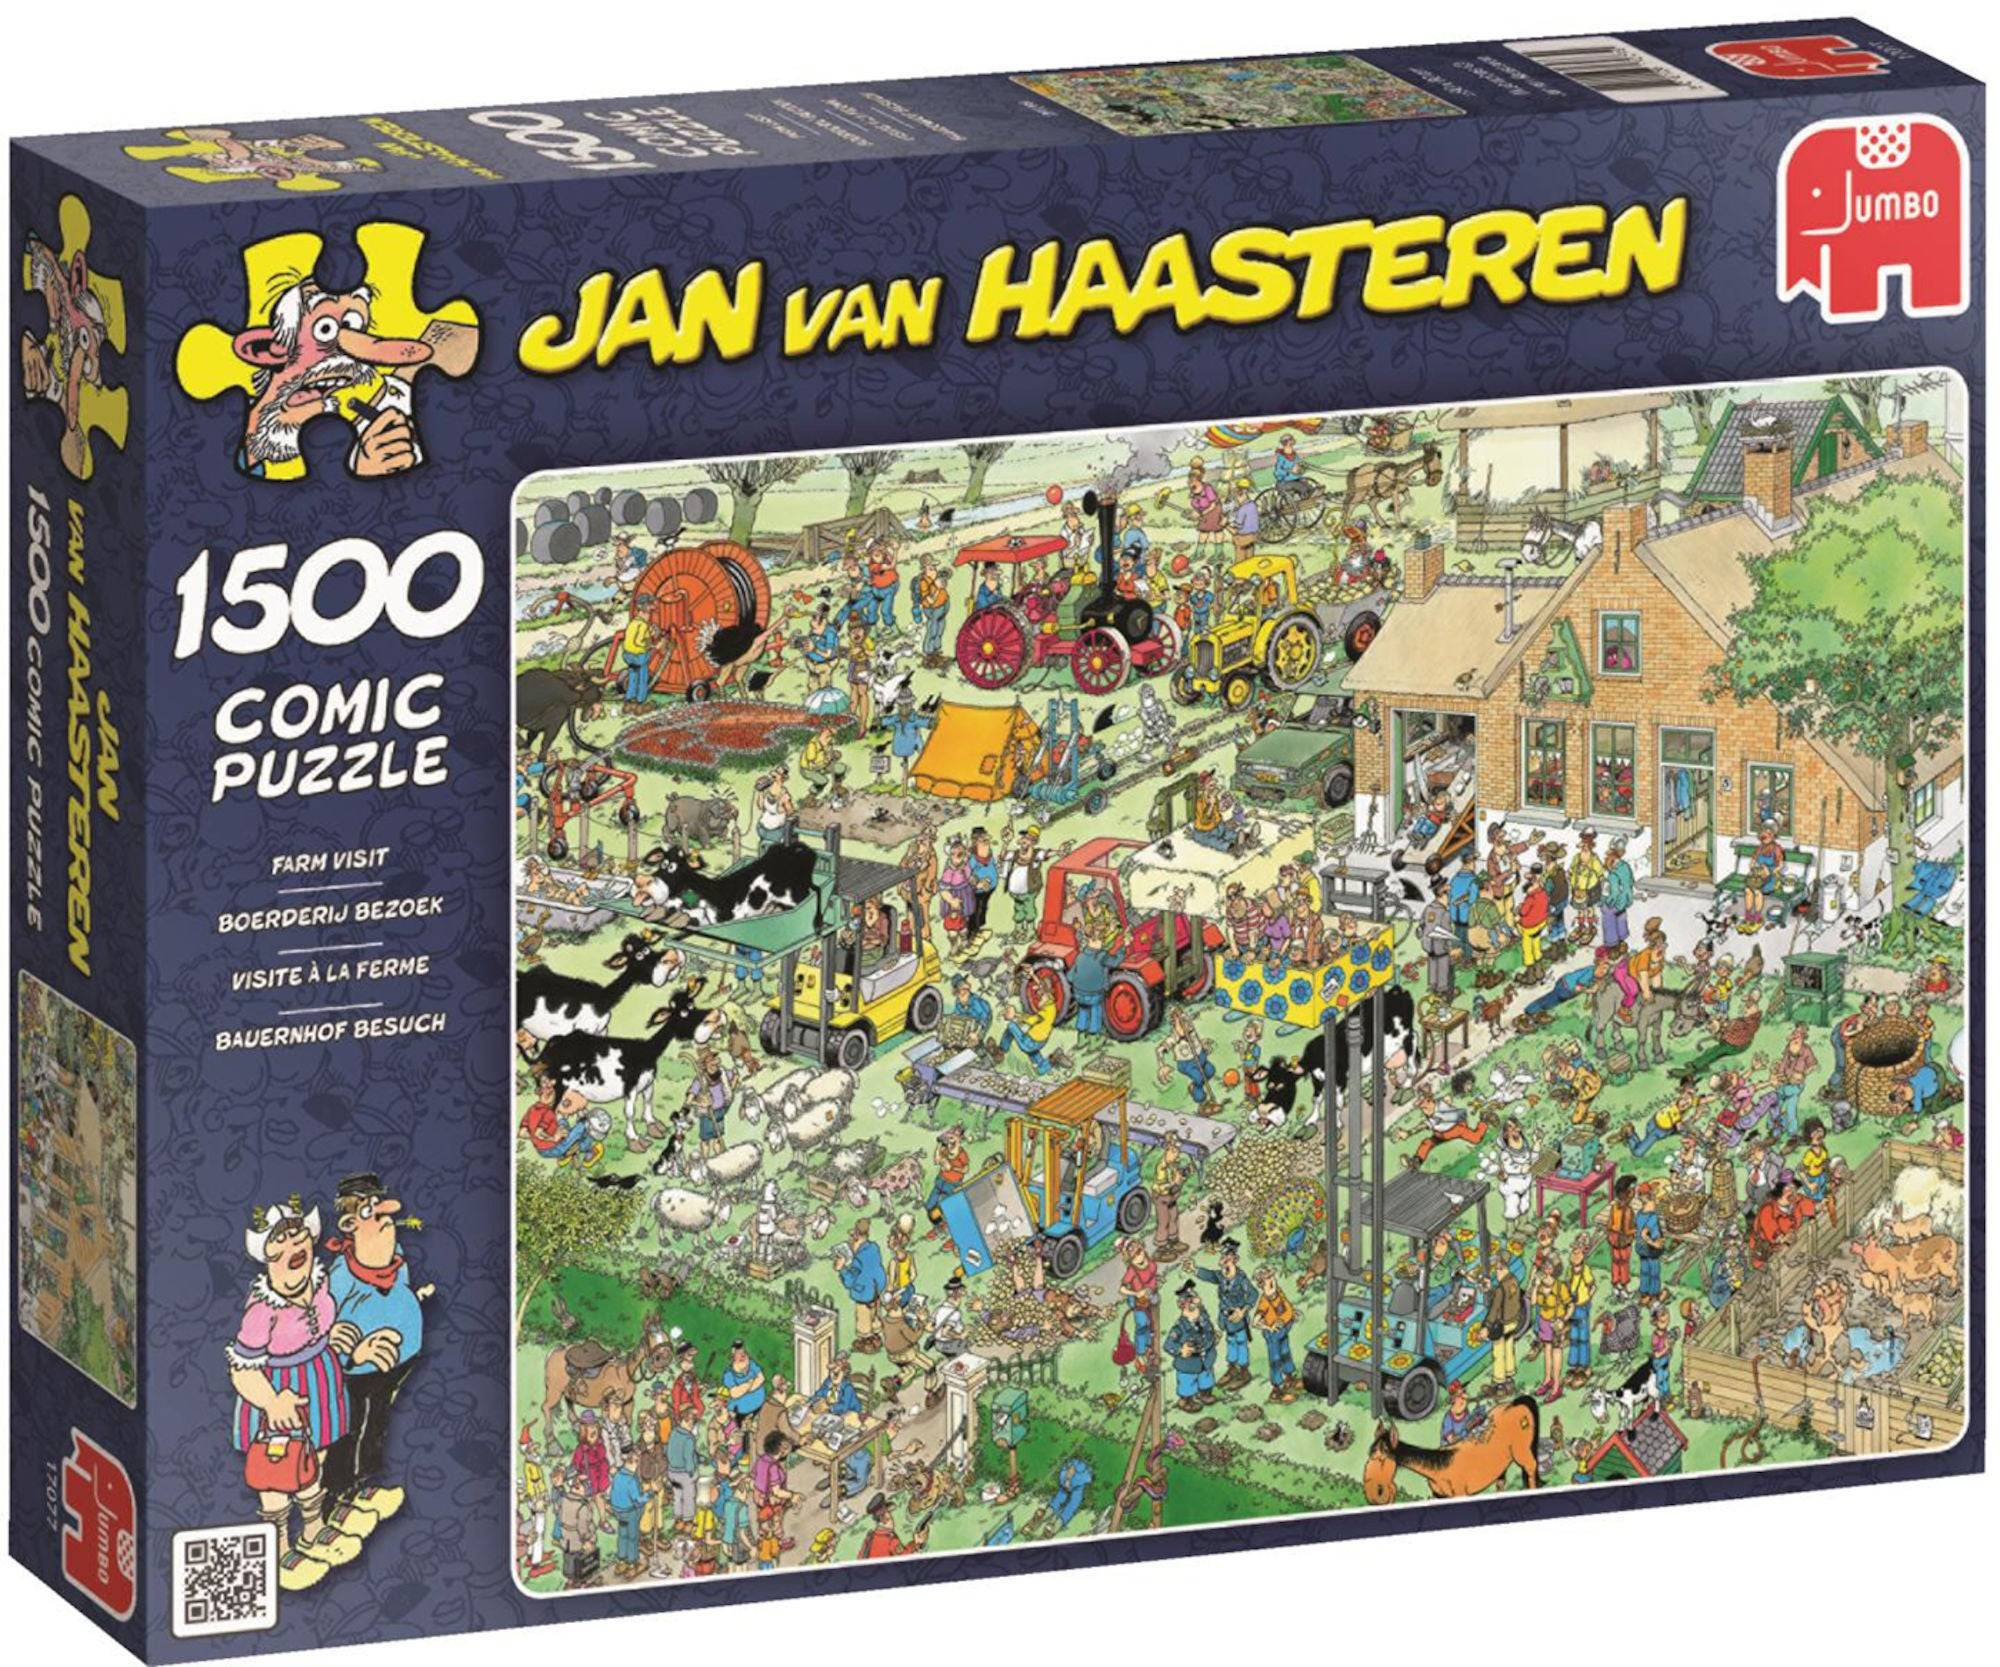 Jumbo Puslespill Jan van Haasteren Farm visit 1500